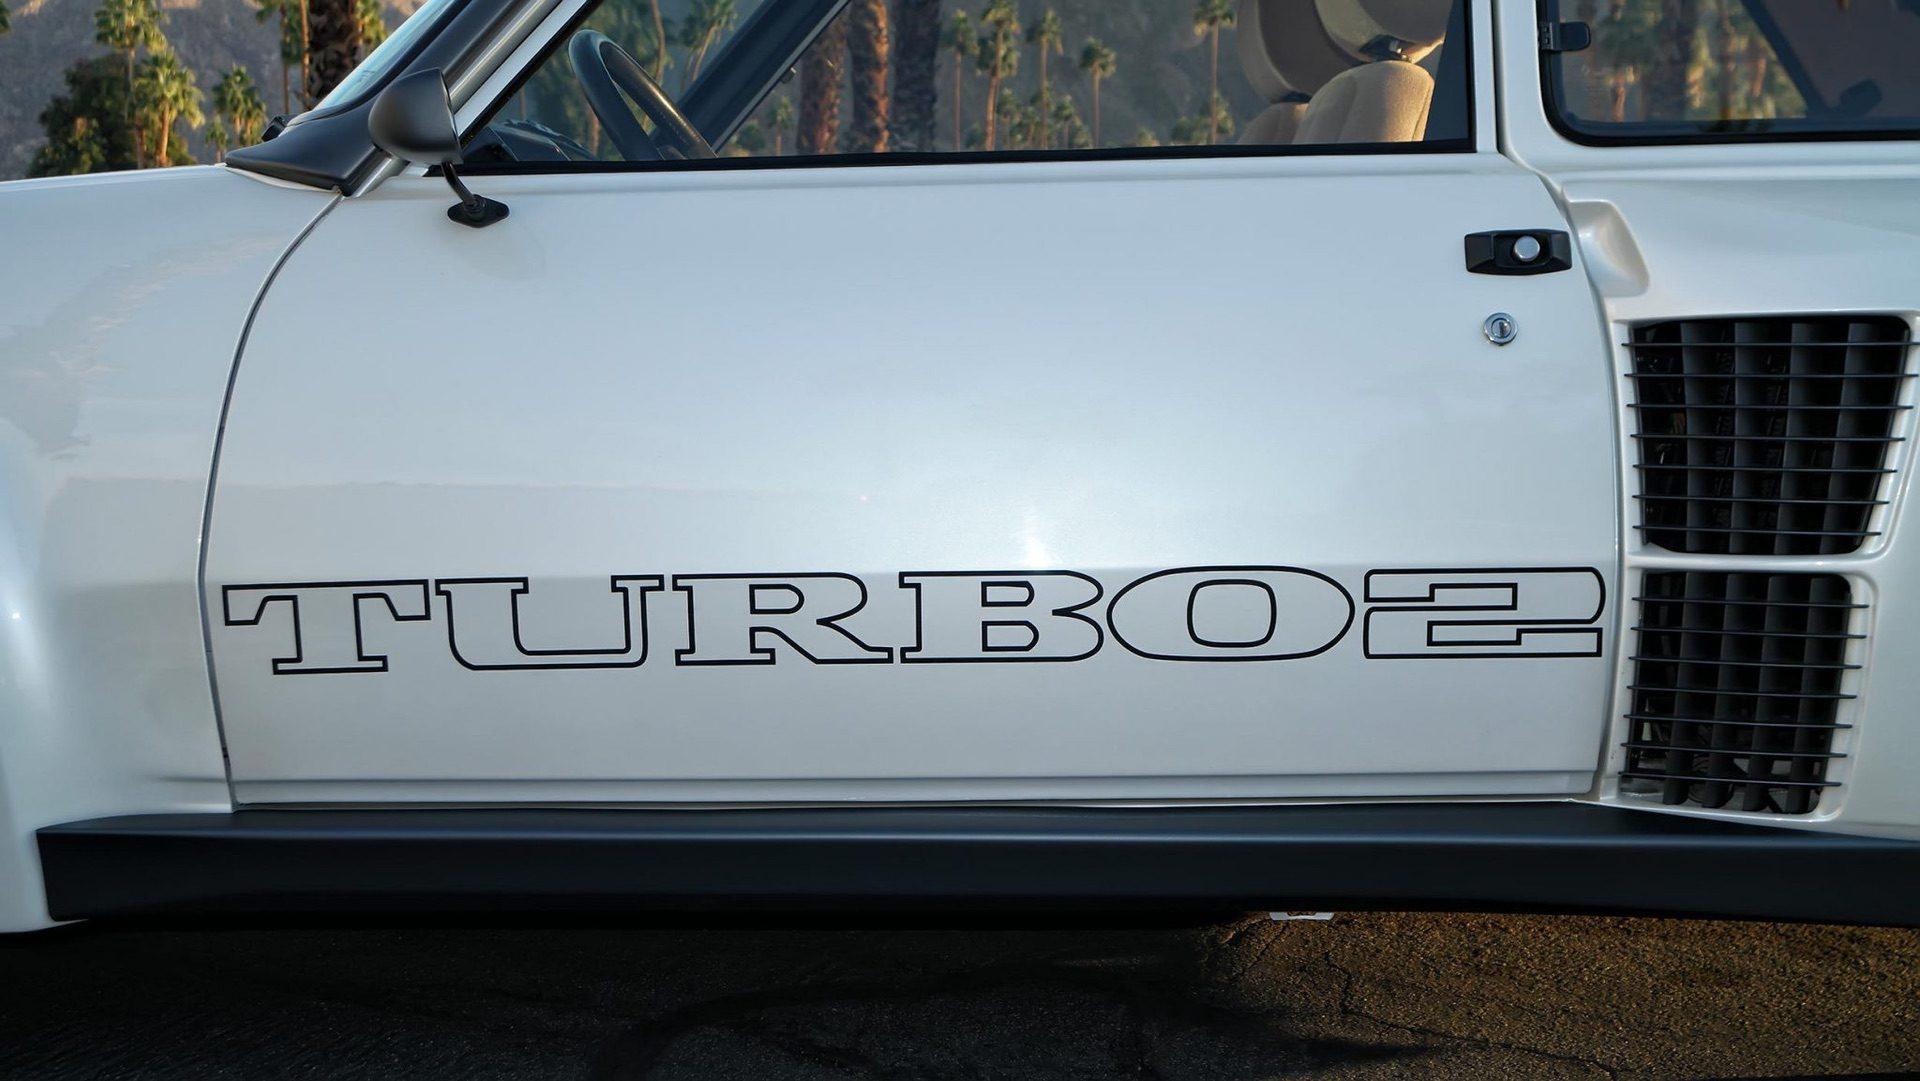 1985_Renault_R5_Turbo_2_rotary-0004